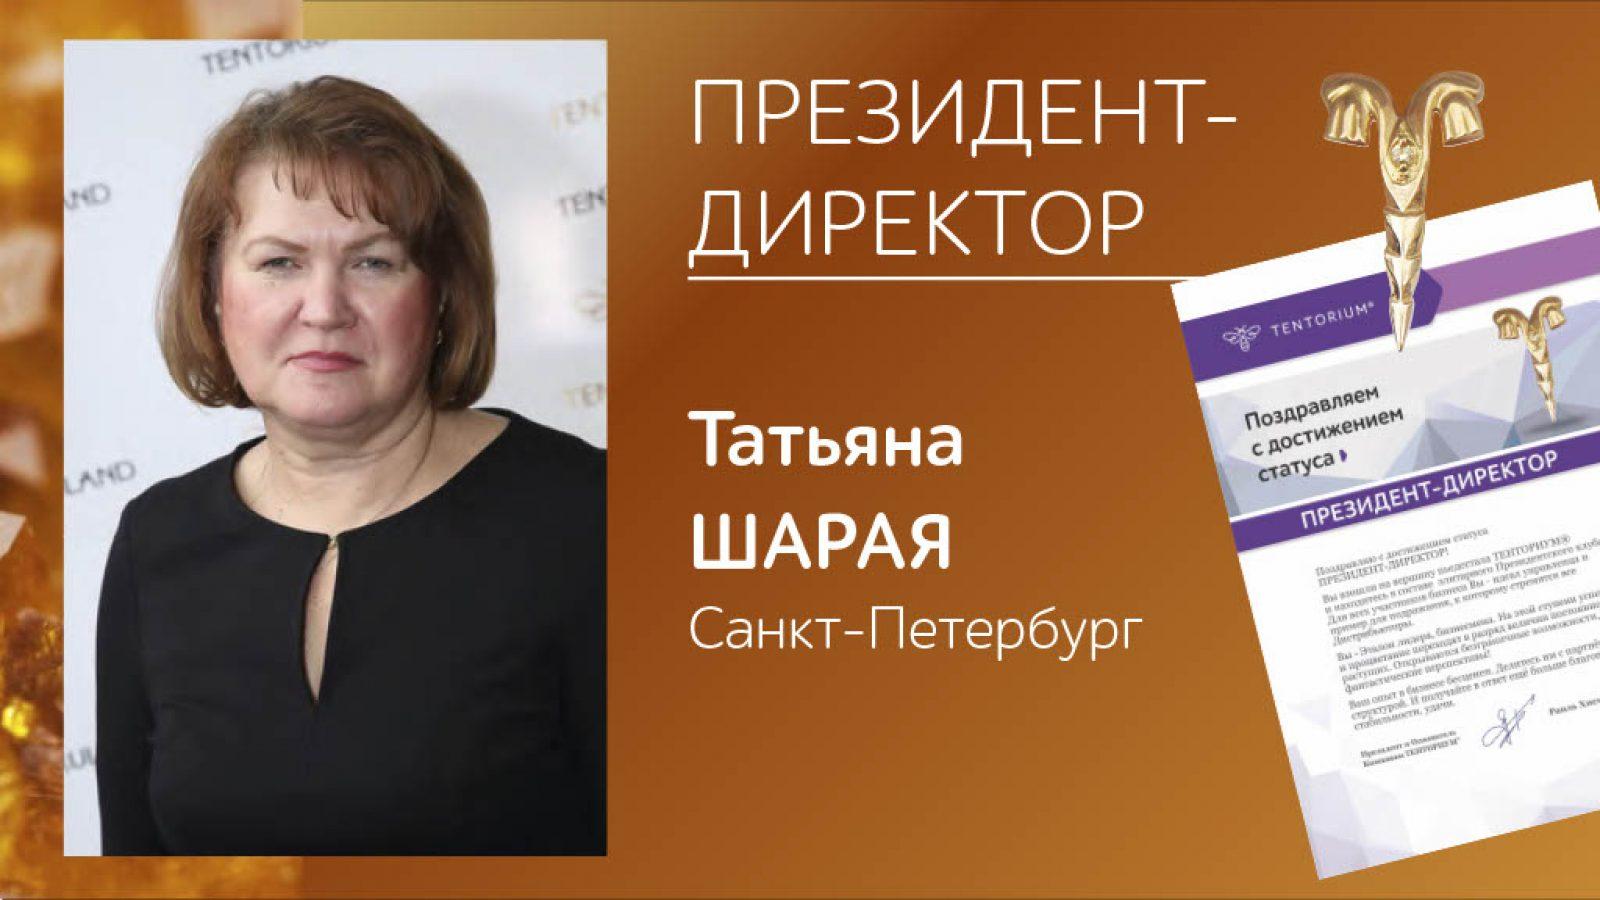 SHTV-2020-_-E-TL-TBTV-TVTGTBTL-TL-TB-TB-_69-TBTVTA1024_69